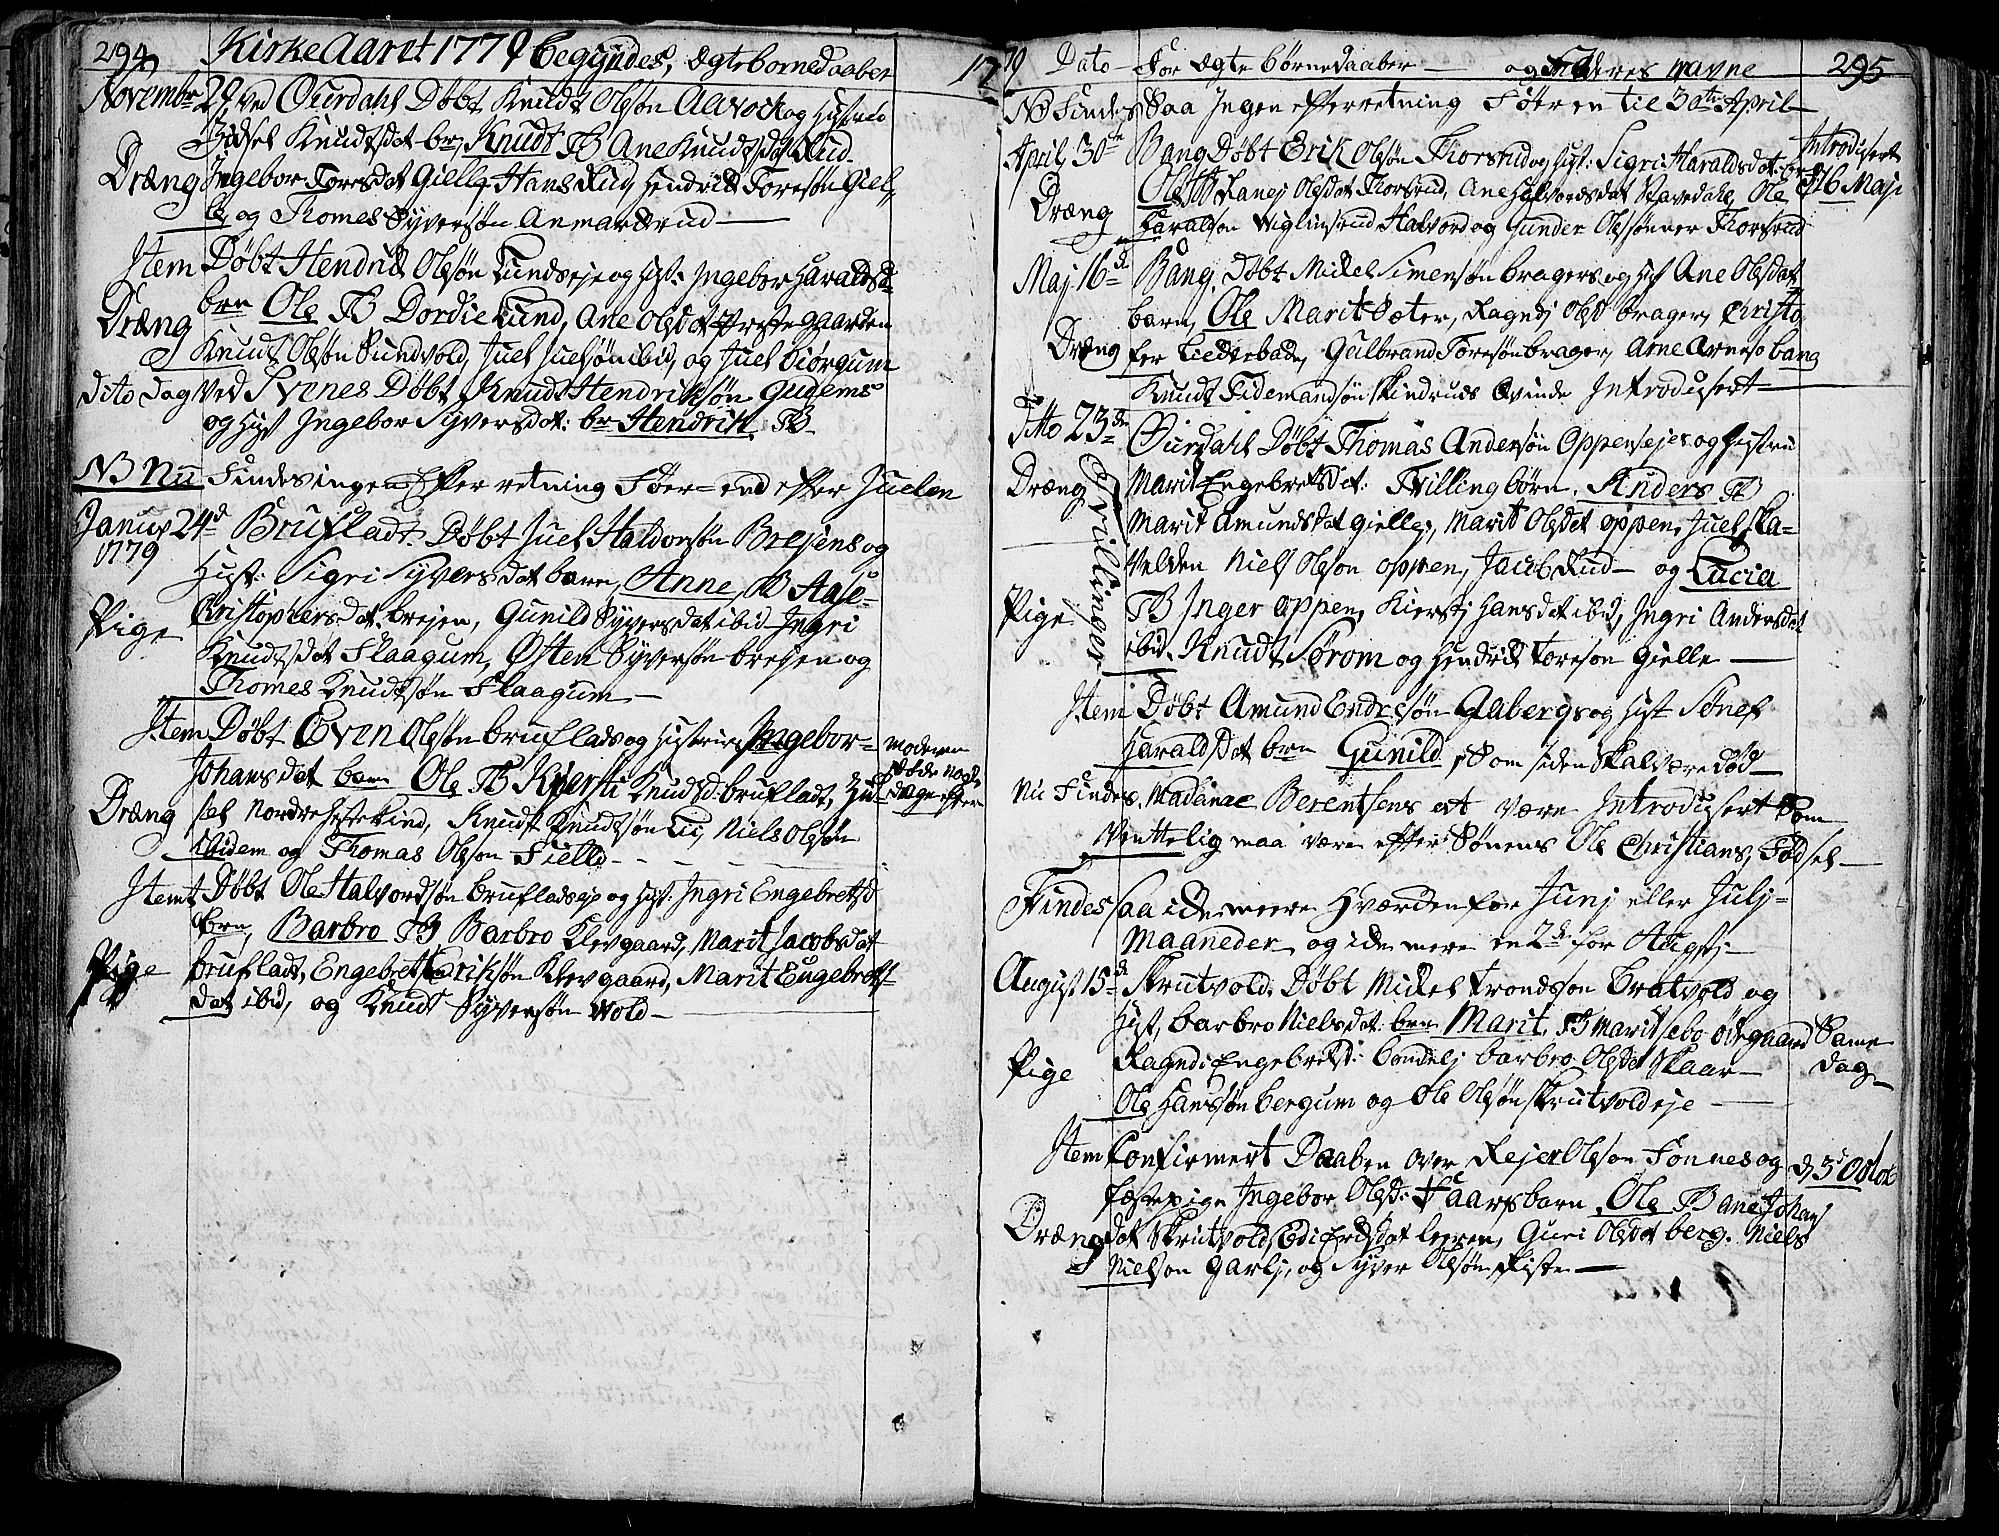 SAH, Aurdal prestekontor, Ministerialbok nr. 5, 1763-1781, s. 294-295